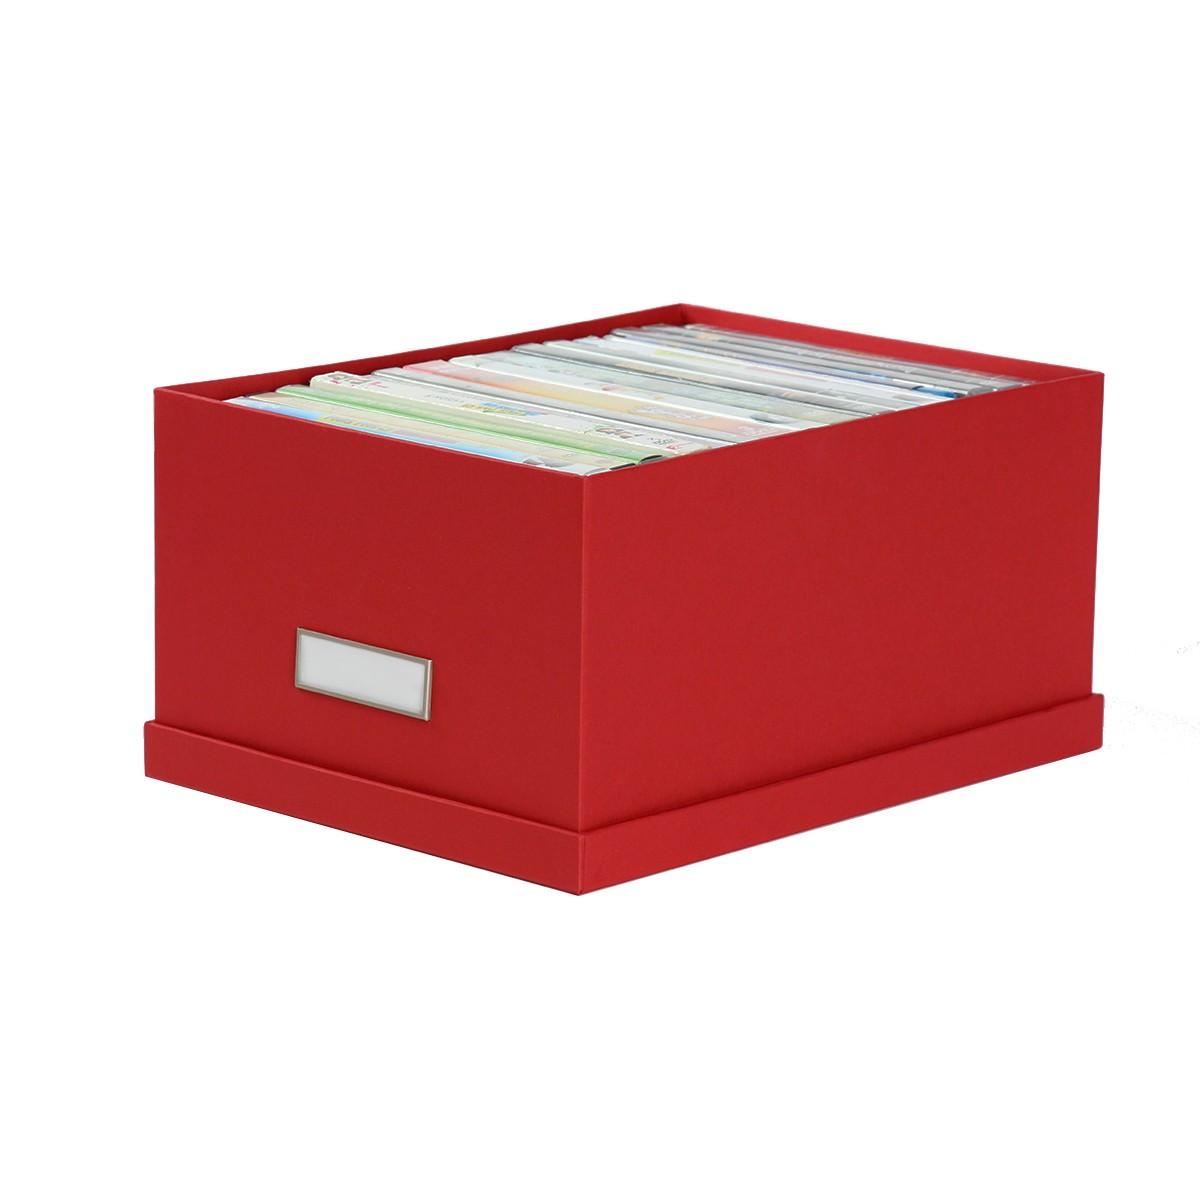 bo te de rangement en carton rouge. Black Bedroom Furniture Sets. Home Design Ideas